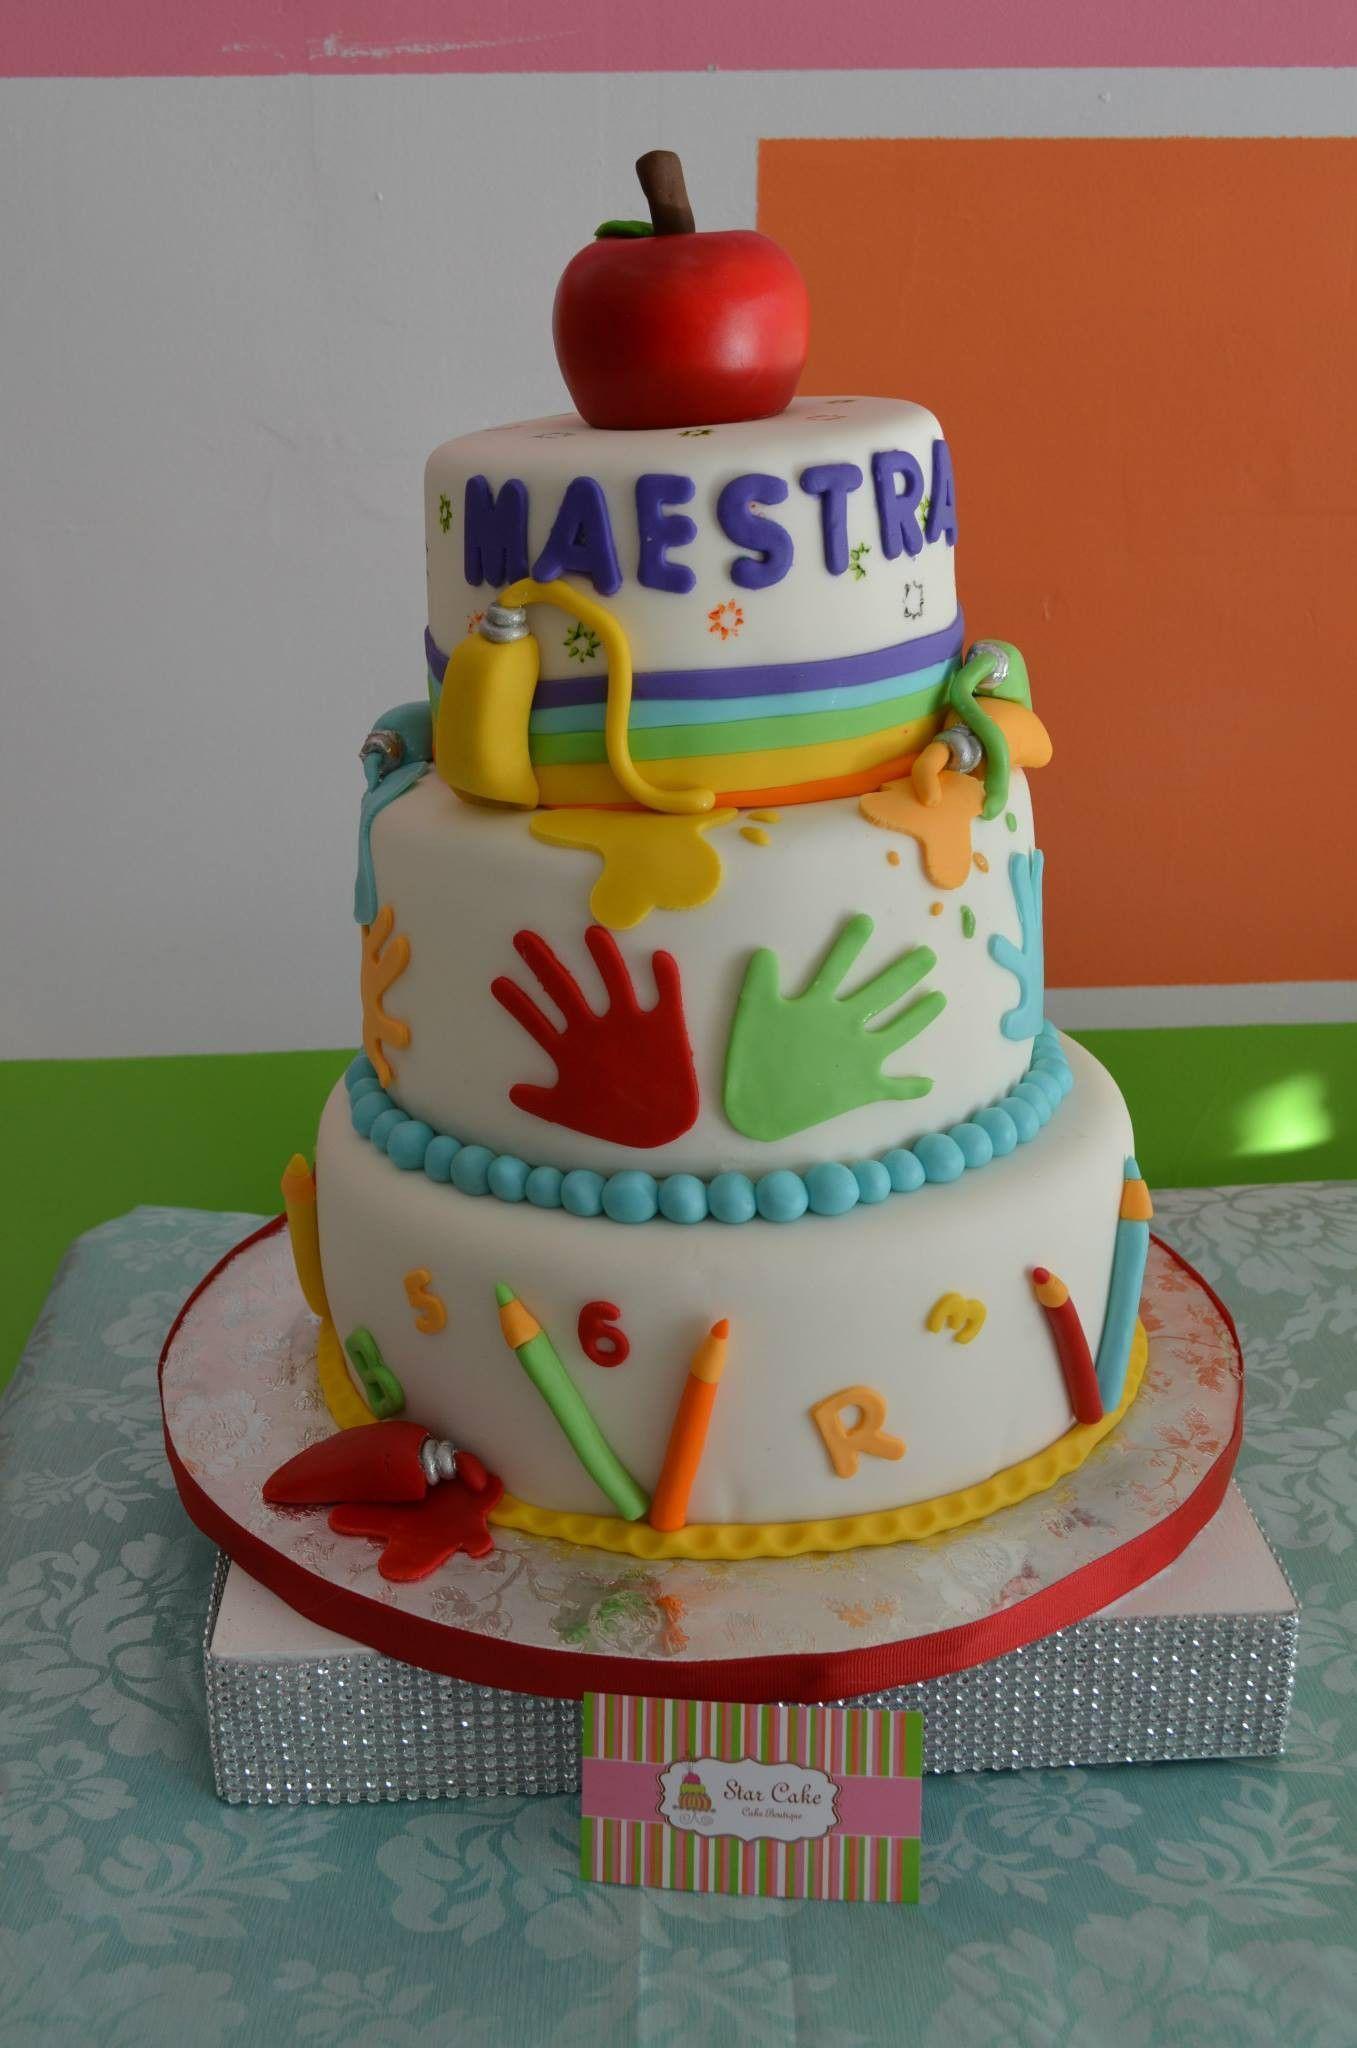 Pastel fondant Día del maestro #starcake Fondant cake Teacher's Day #diadelmaestro Pastel fondant Día del maestro #starcake Fondant cake Teacher's Day #diadelmaestro Pastel fondant Día del maestro #starcake Fondant cake Teacher's Day #diadelmaestro Pastel fondant Día del maestro #starcake Fondant cake Teacher's Day #diadelmaestro